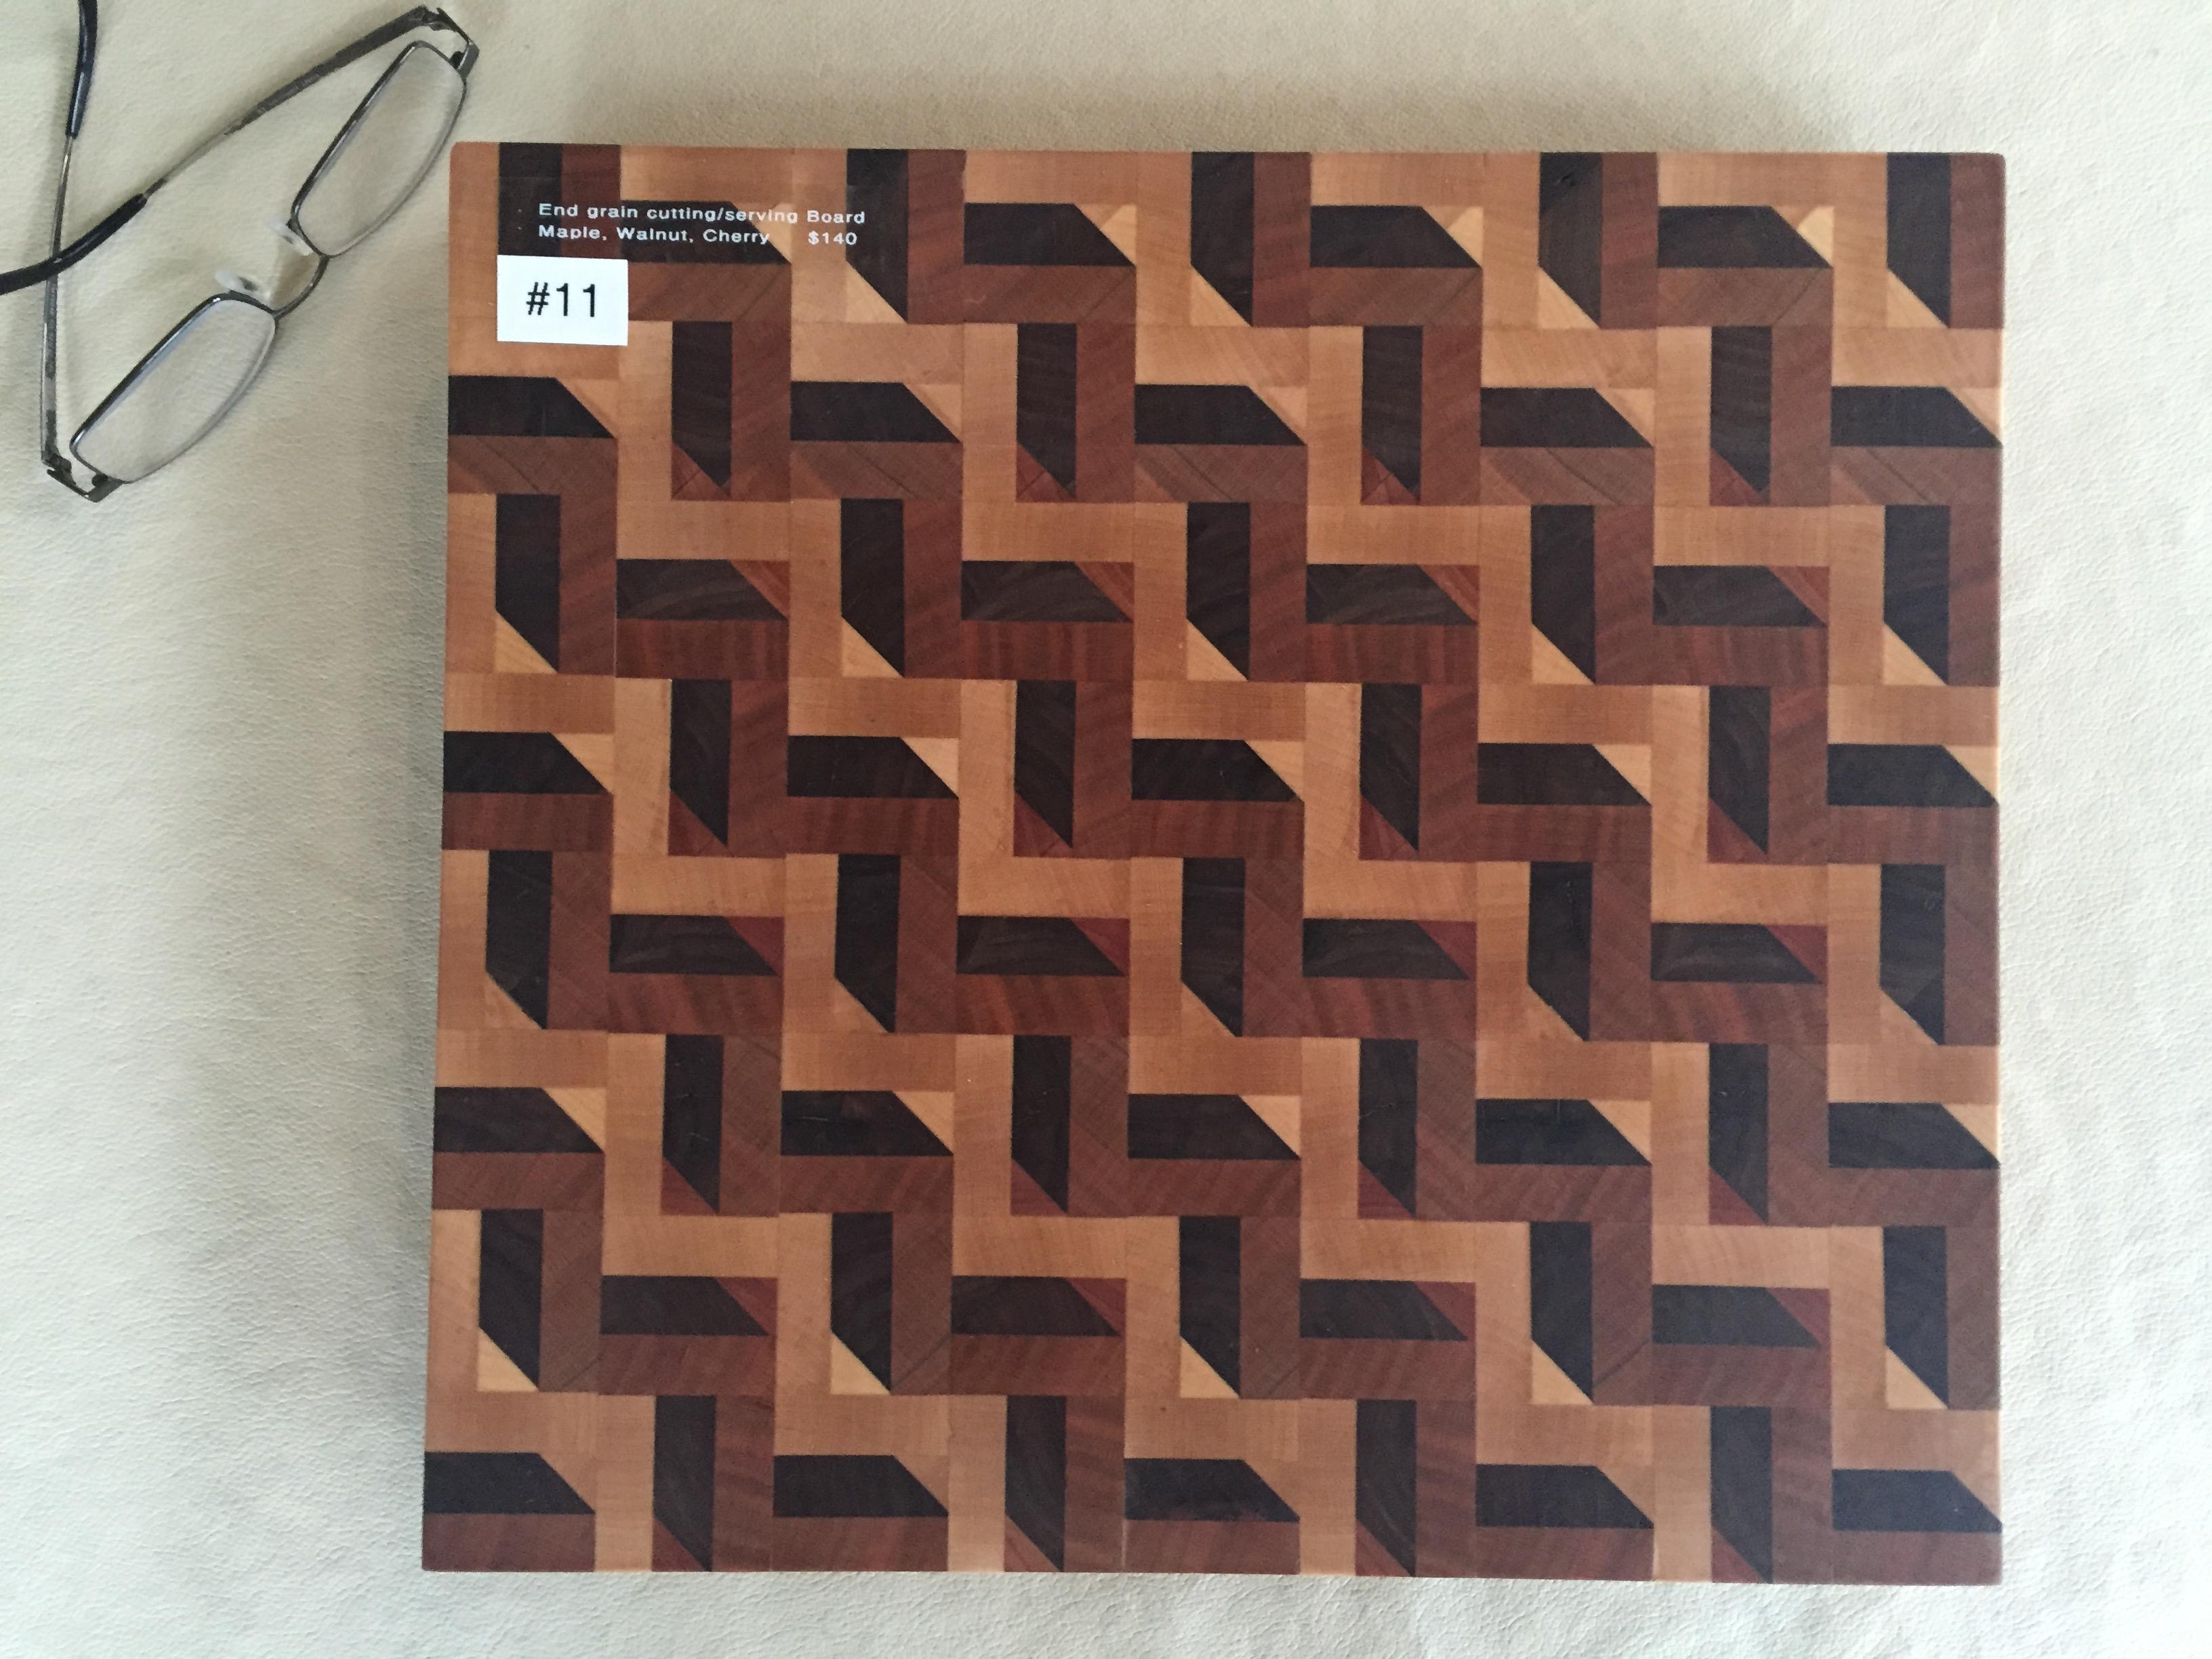 #11 Rectangular serving/cutting board 3D illusion